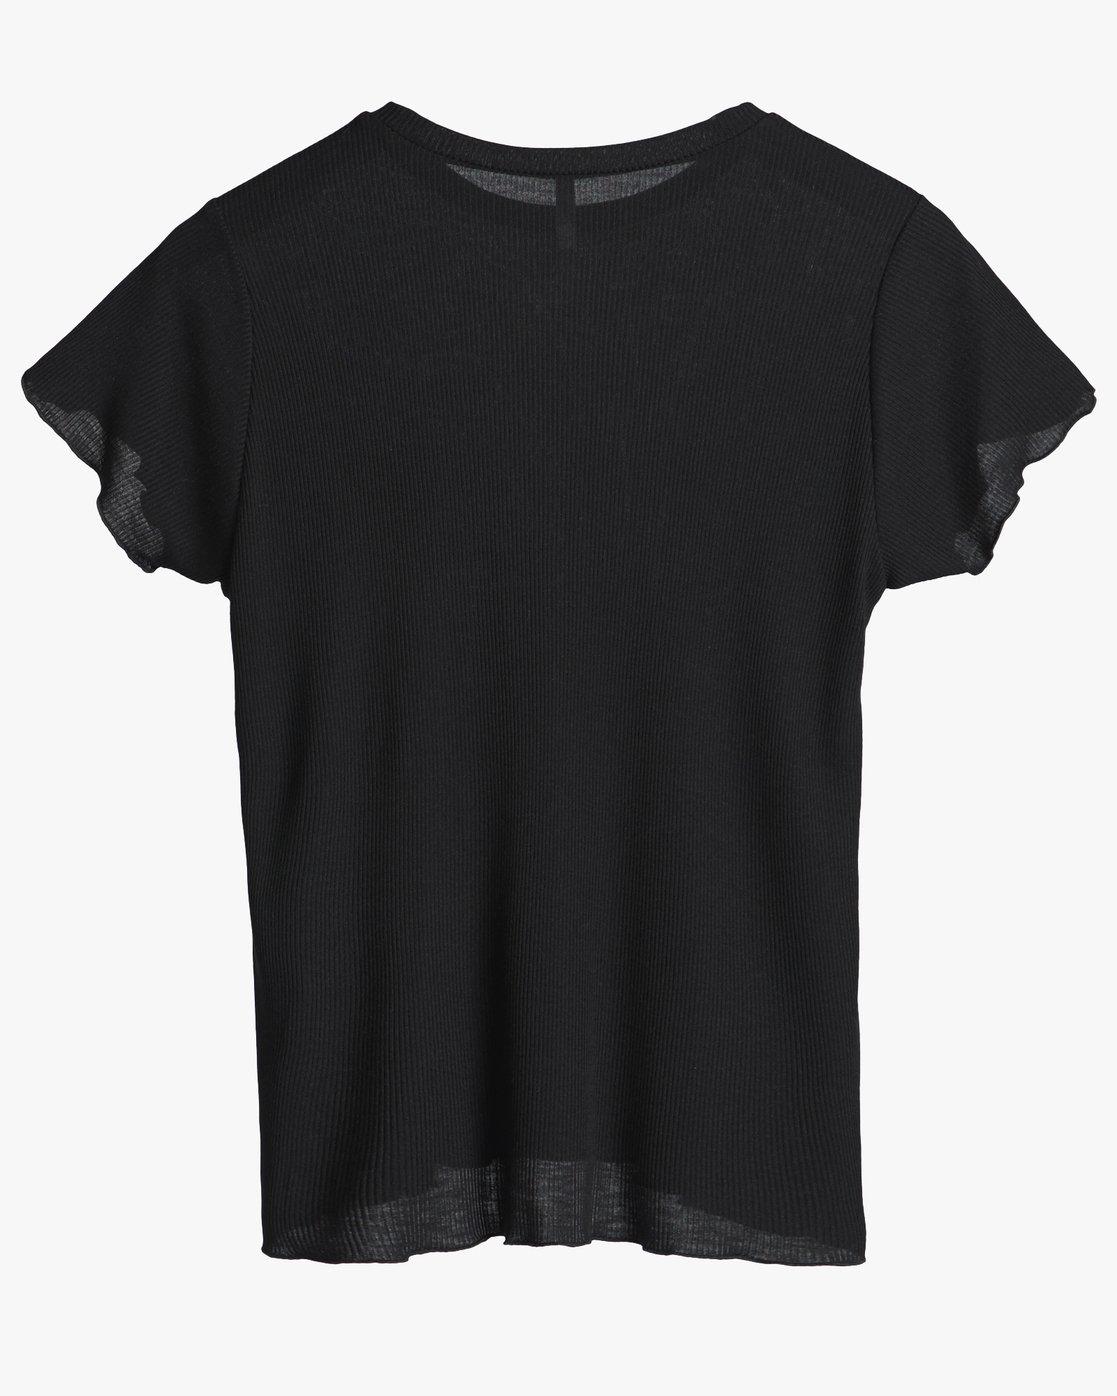 3 Trent Whitehead Crying Heart - Short Sleeves T-Shirt for Women Black P3SSRCRVS9 RVCA